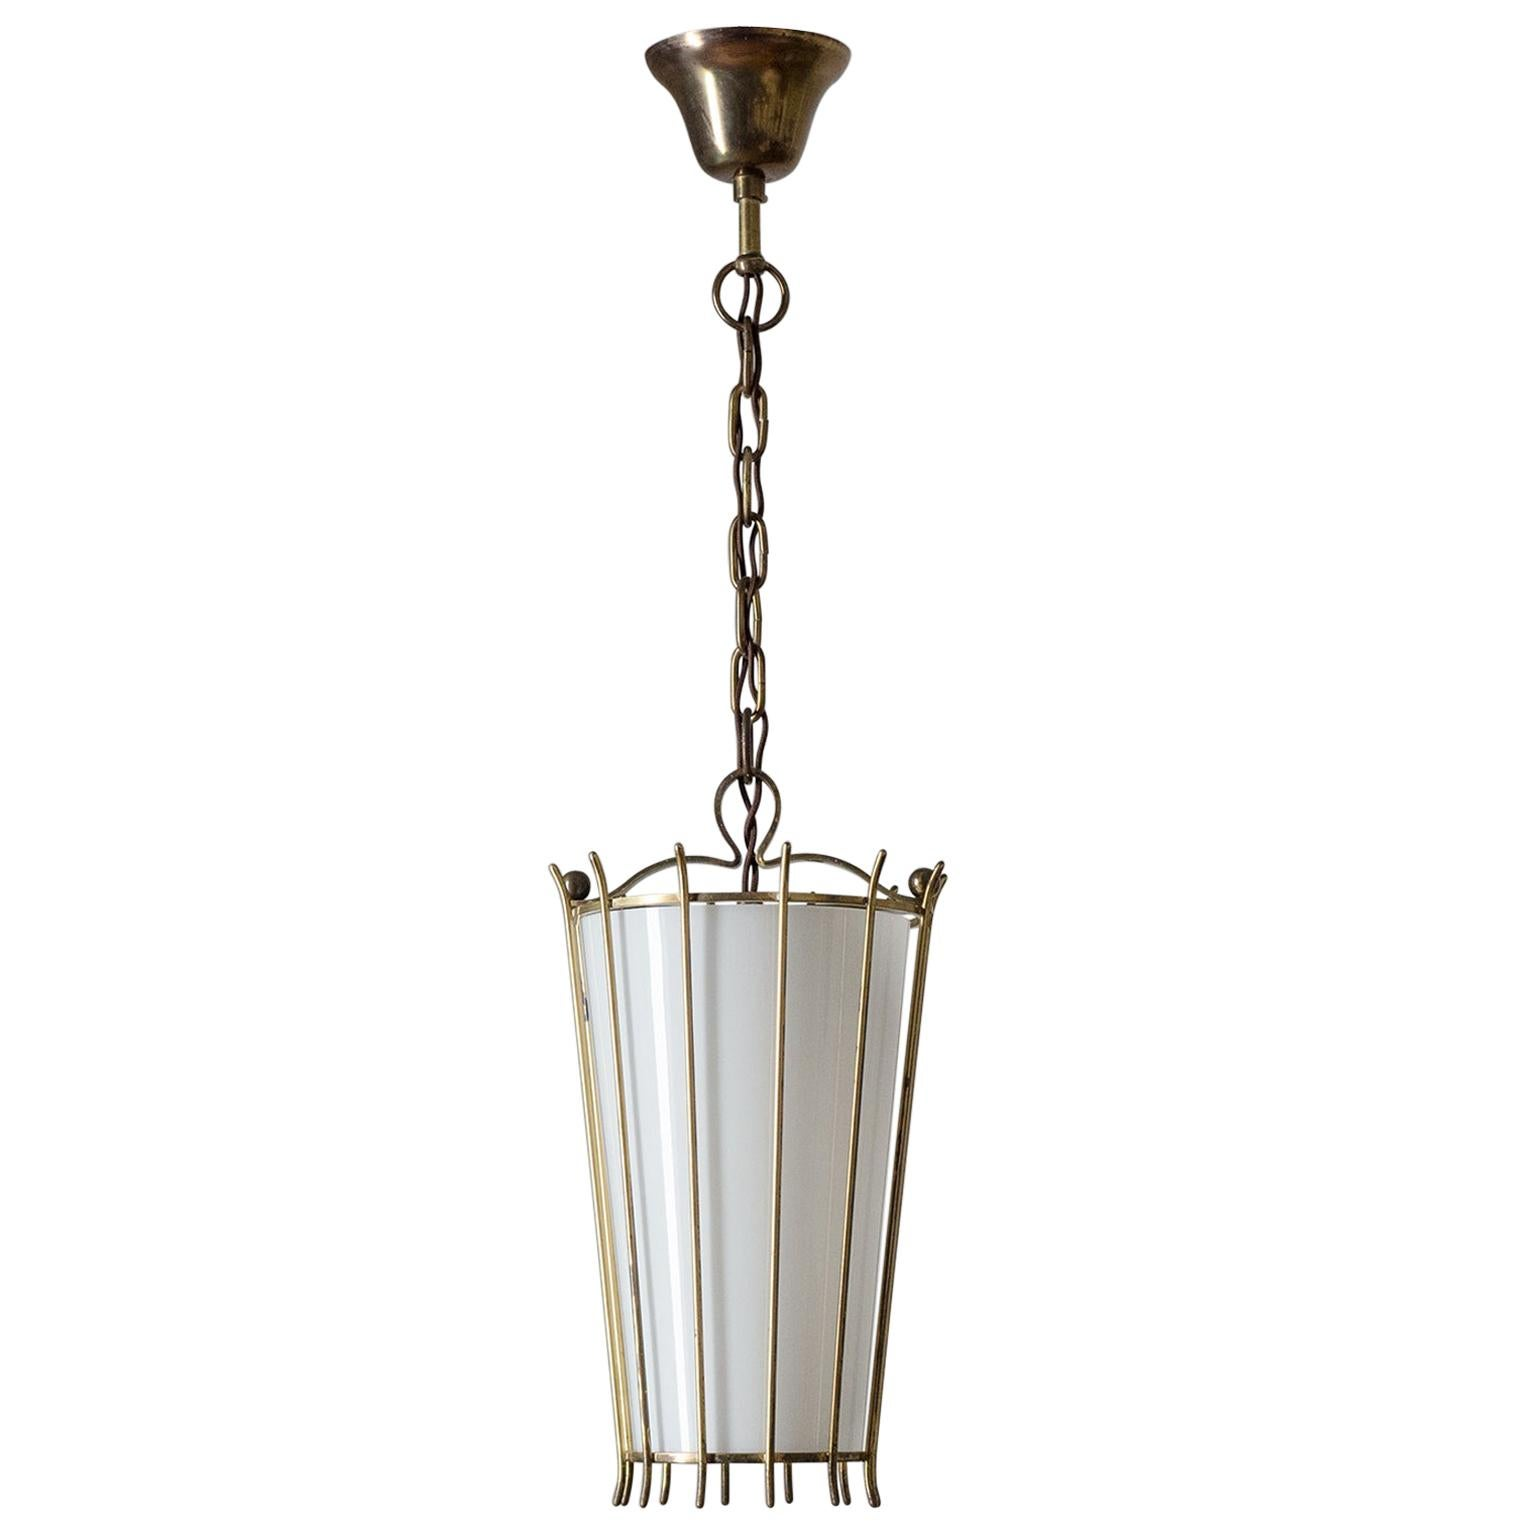 Austrian 'Cage' Lantern, 1940s, Brass and Glass